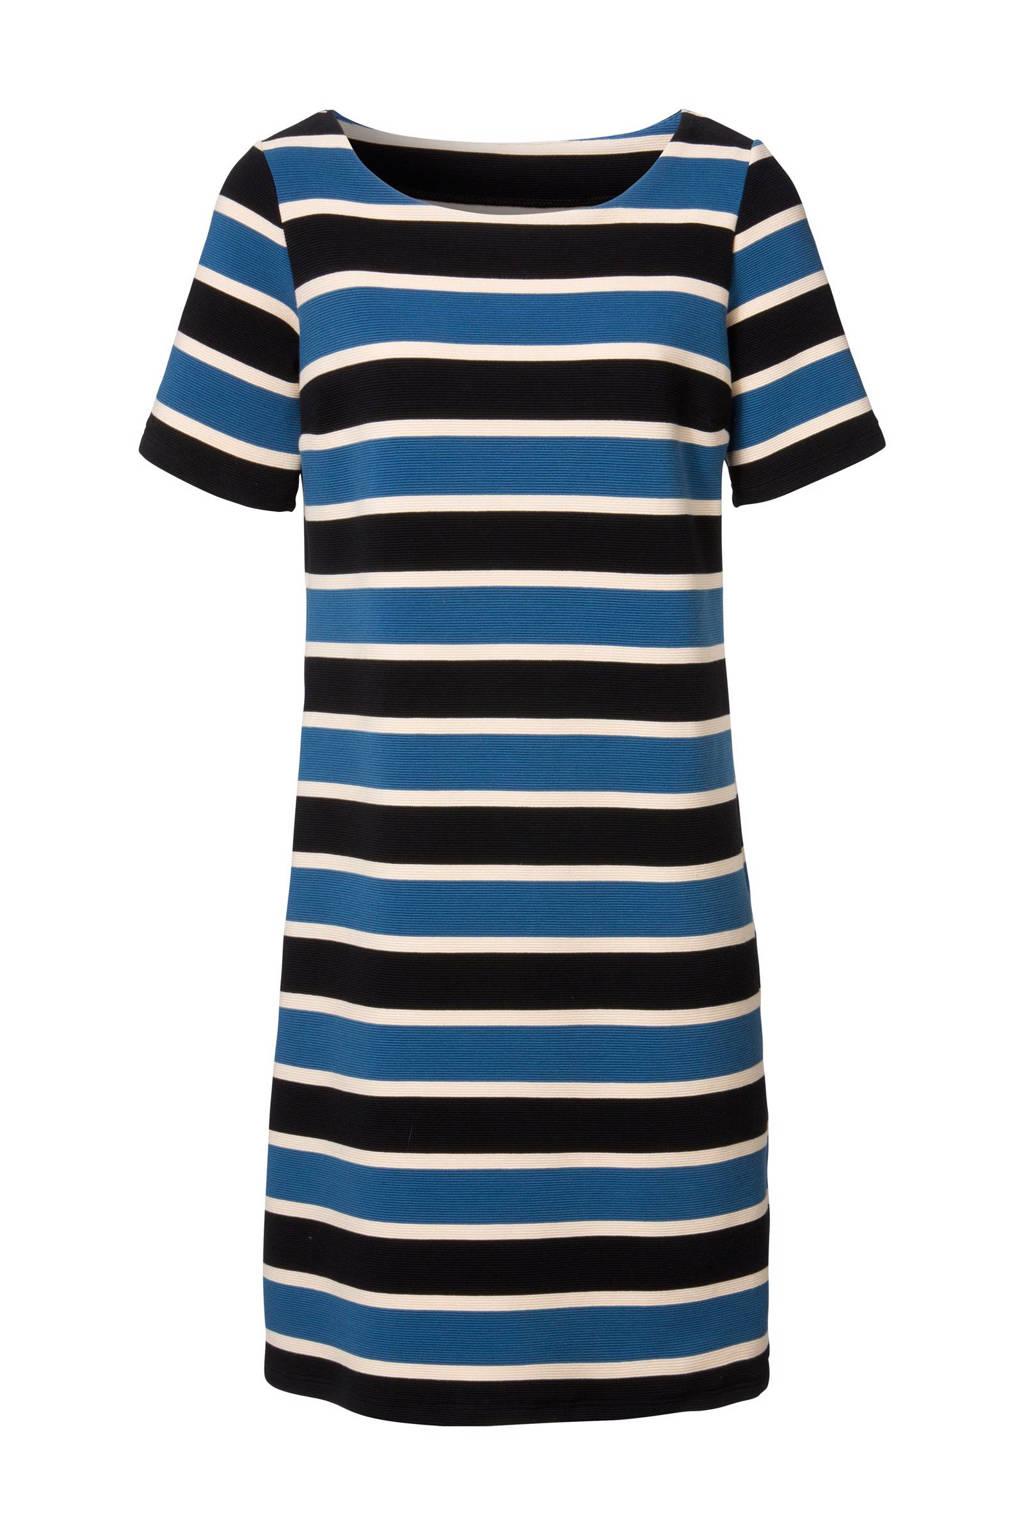 Didi A-lijn jurk, Zwart/blauw